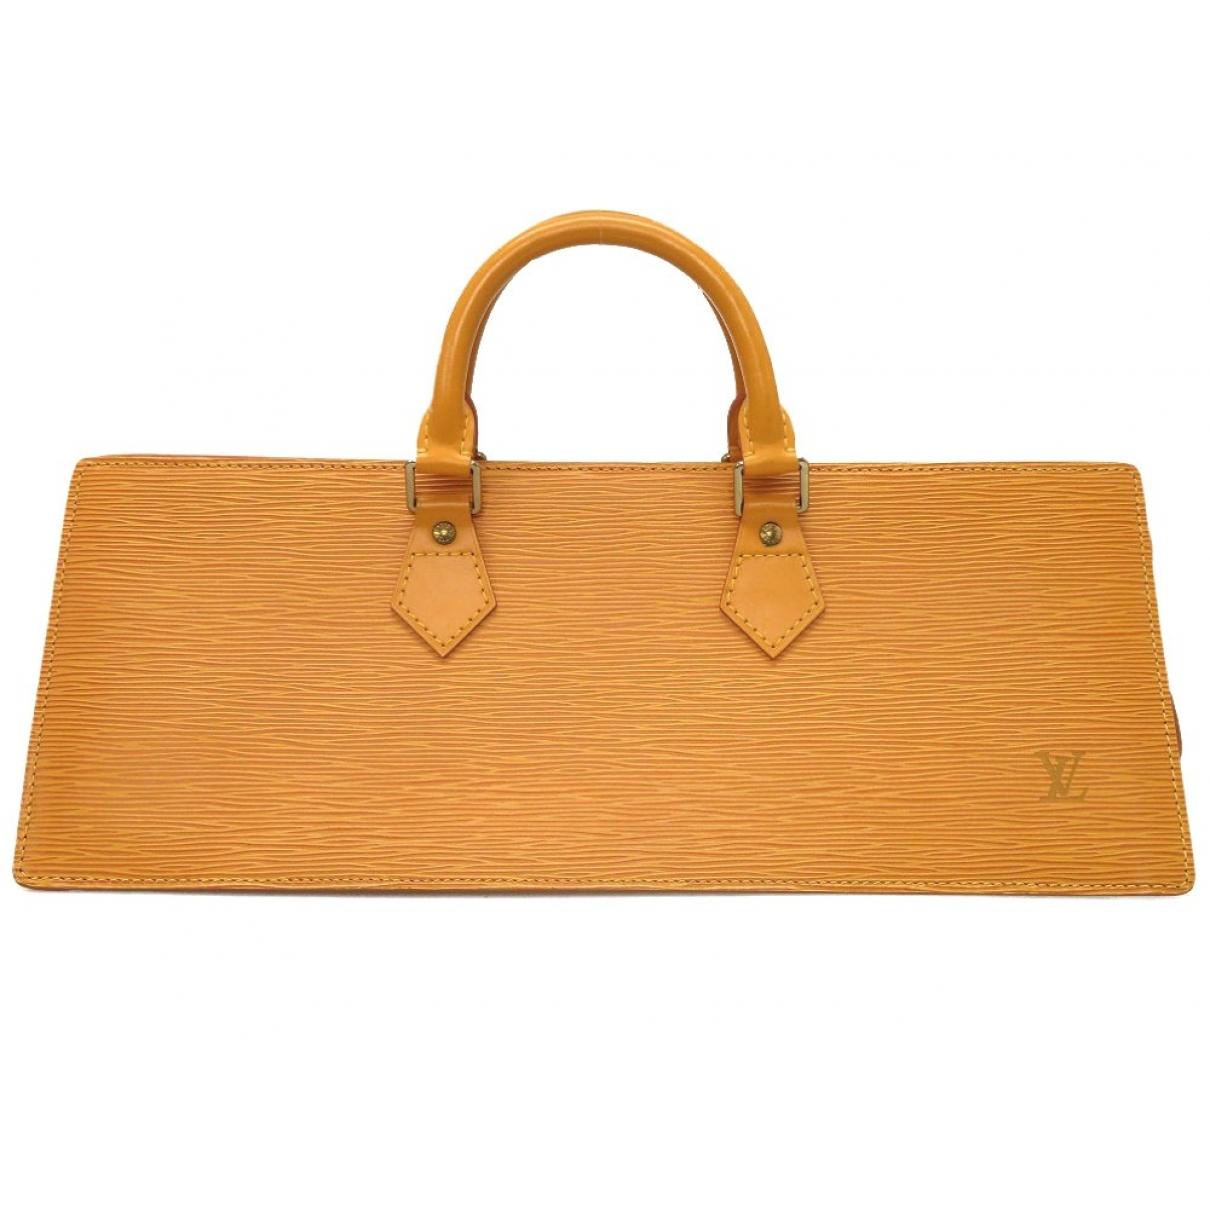 Louis Vuitton - Sac a main Triangle pour femme en cuir - jaune